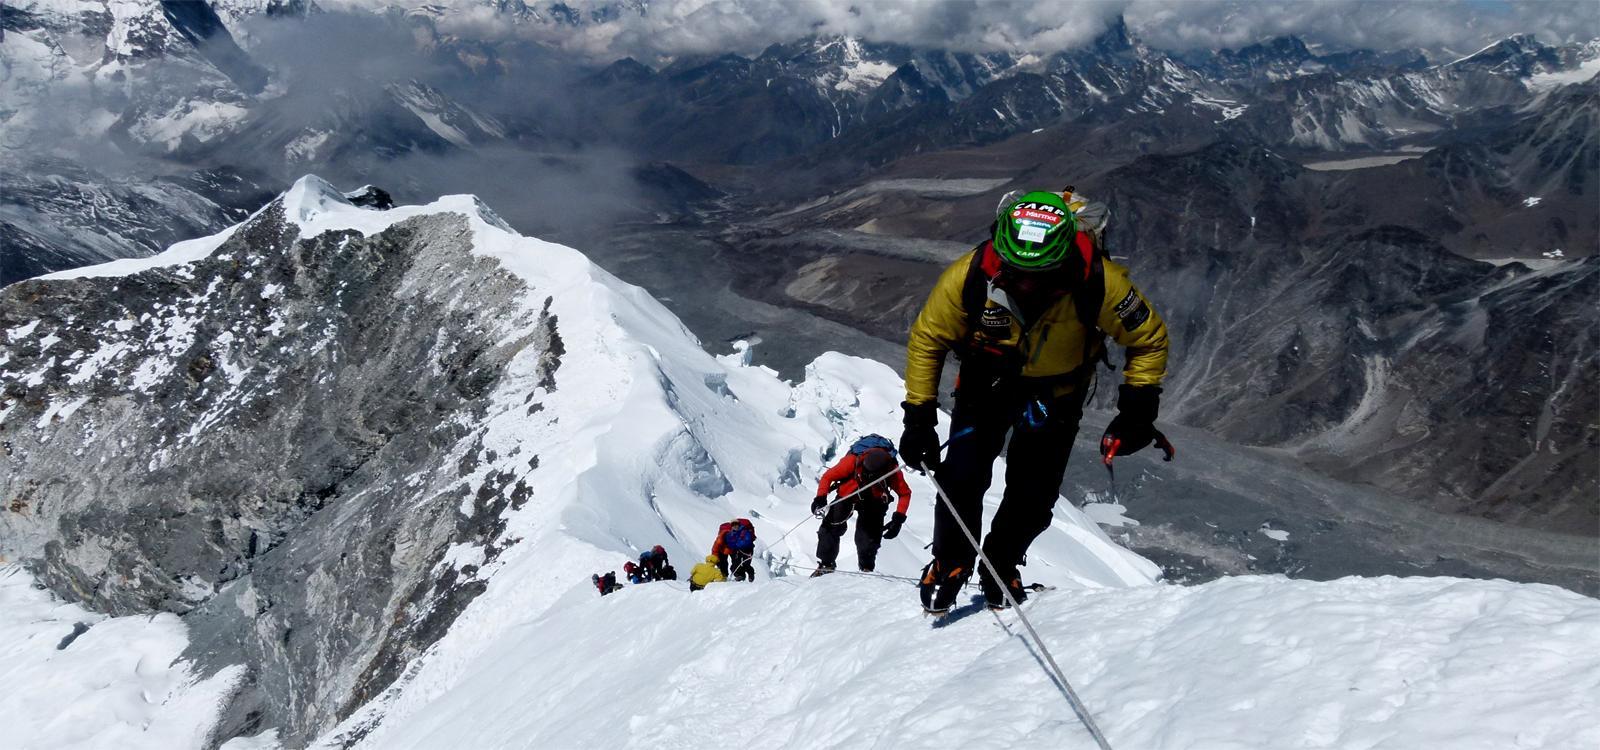 Everest Three Passes with Island Peak  Climbing (6189 m)